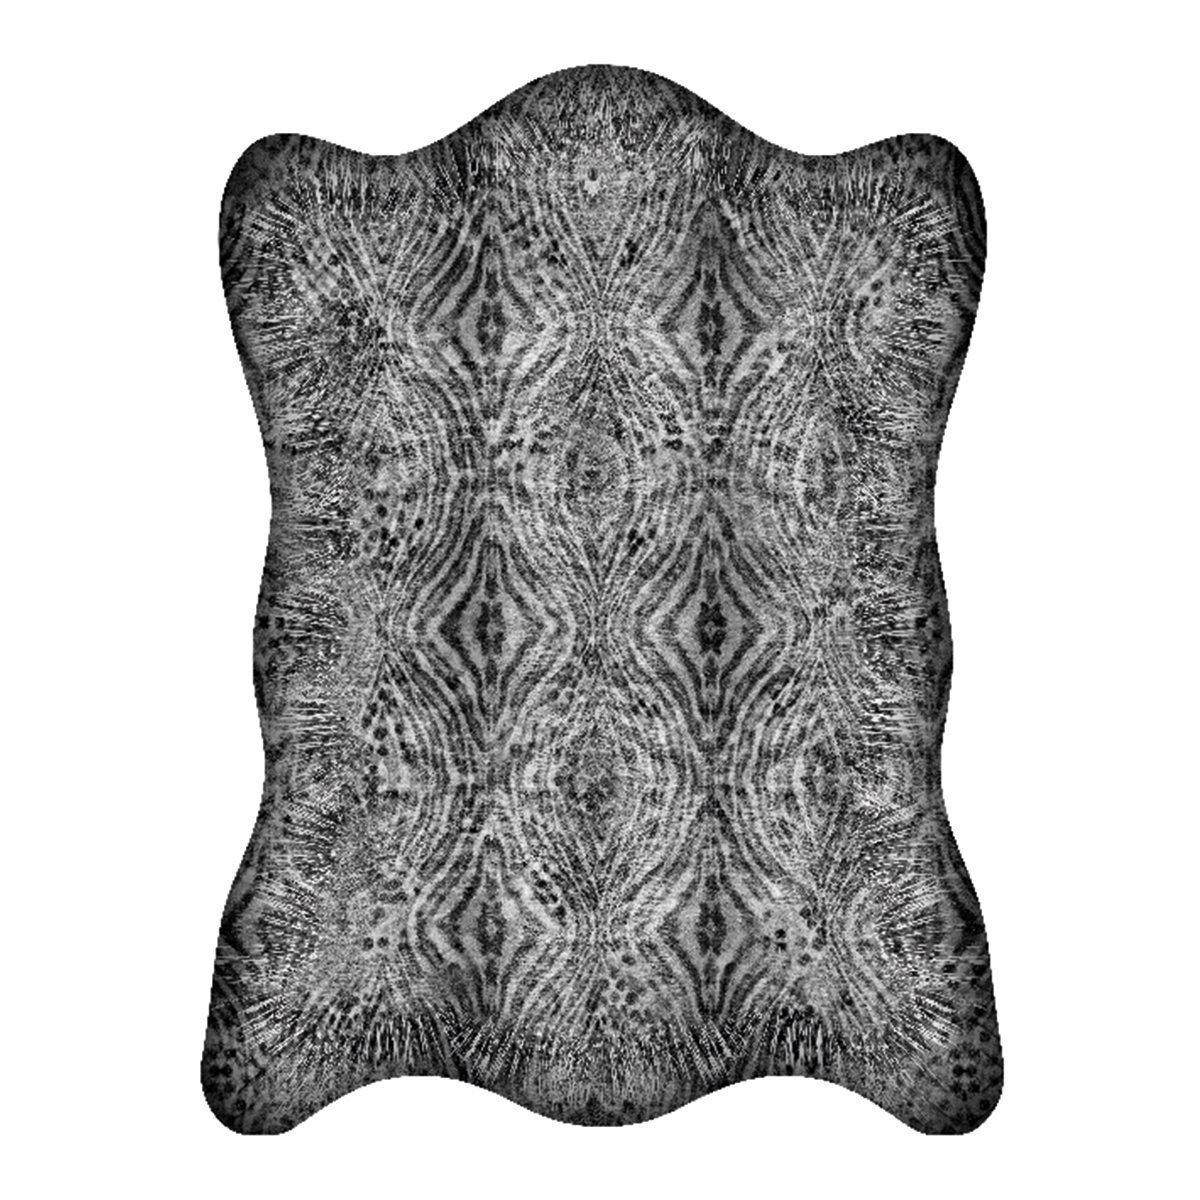 Moooi Carpets - Armoured Boar Vloerkleed - 400 x 300 cm. - Soft Yarn